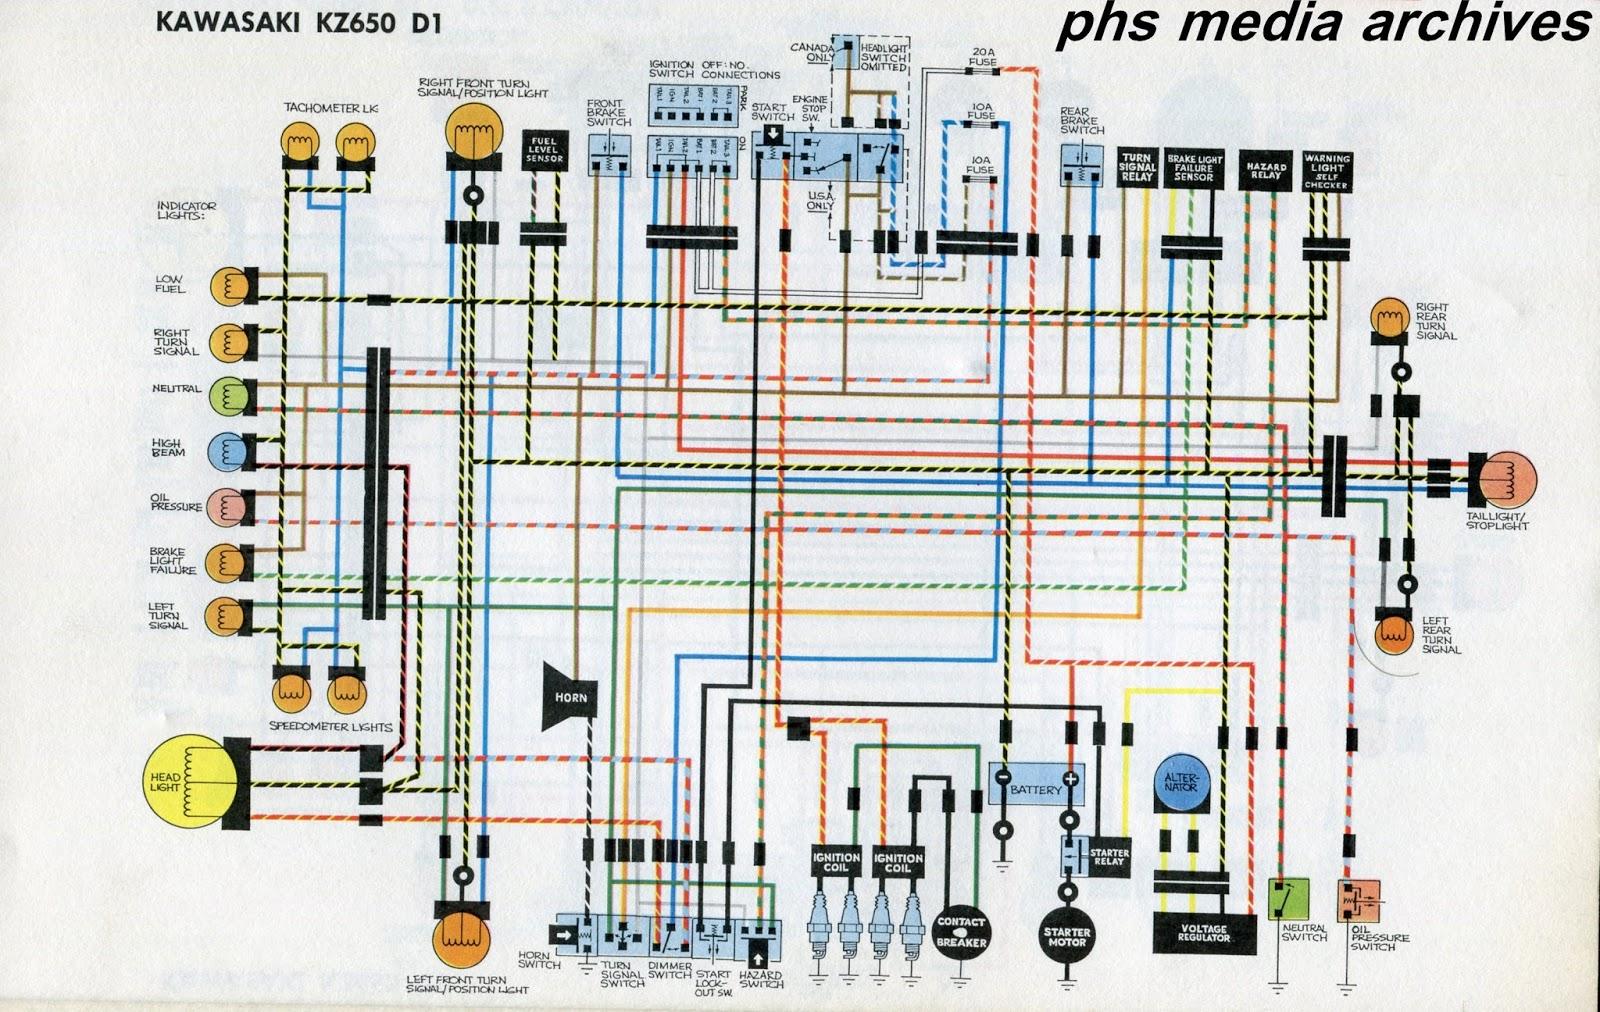 medium resolution of bobber kz650 wiring diagram wiring diagram advancekz650 wiring diagram wiring diagram bobber kz650 wiring diagram